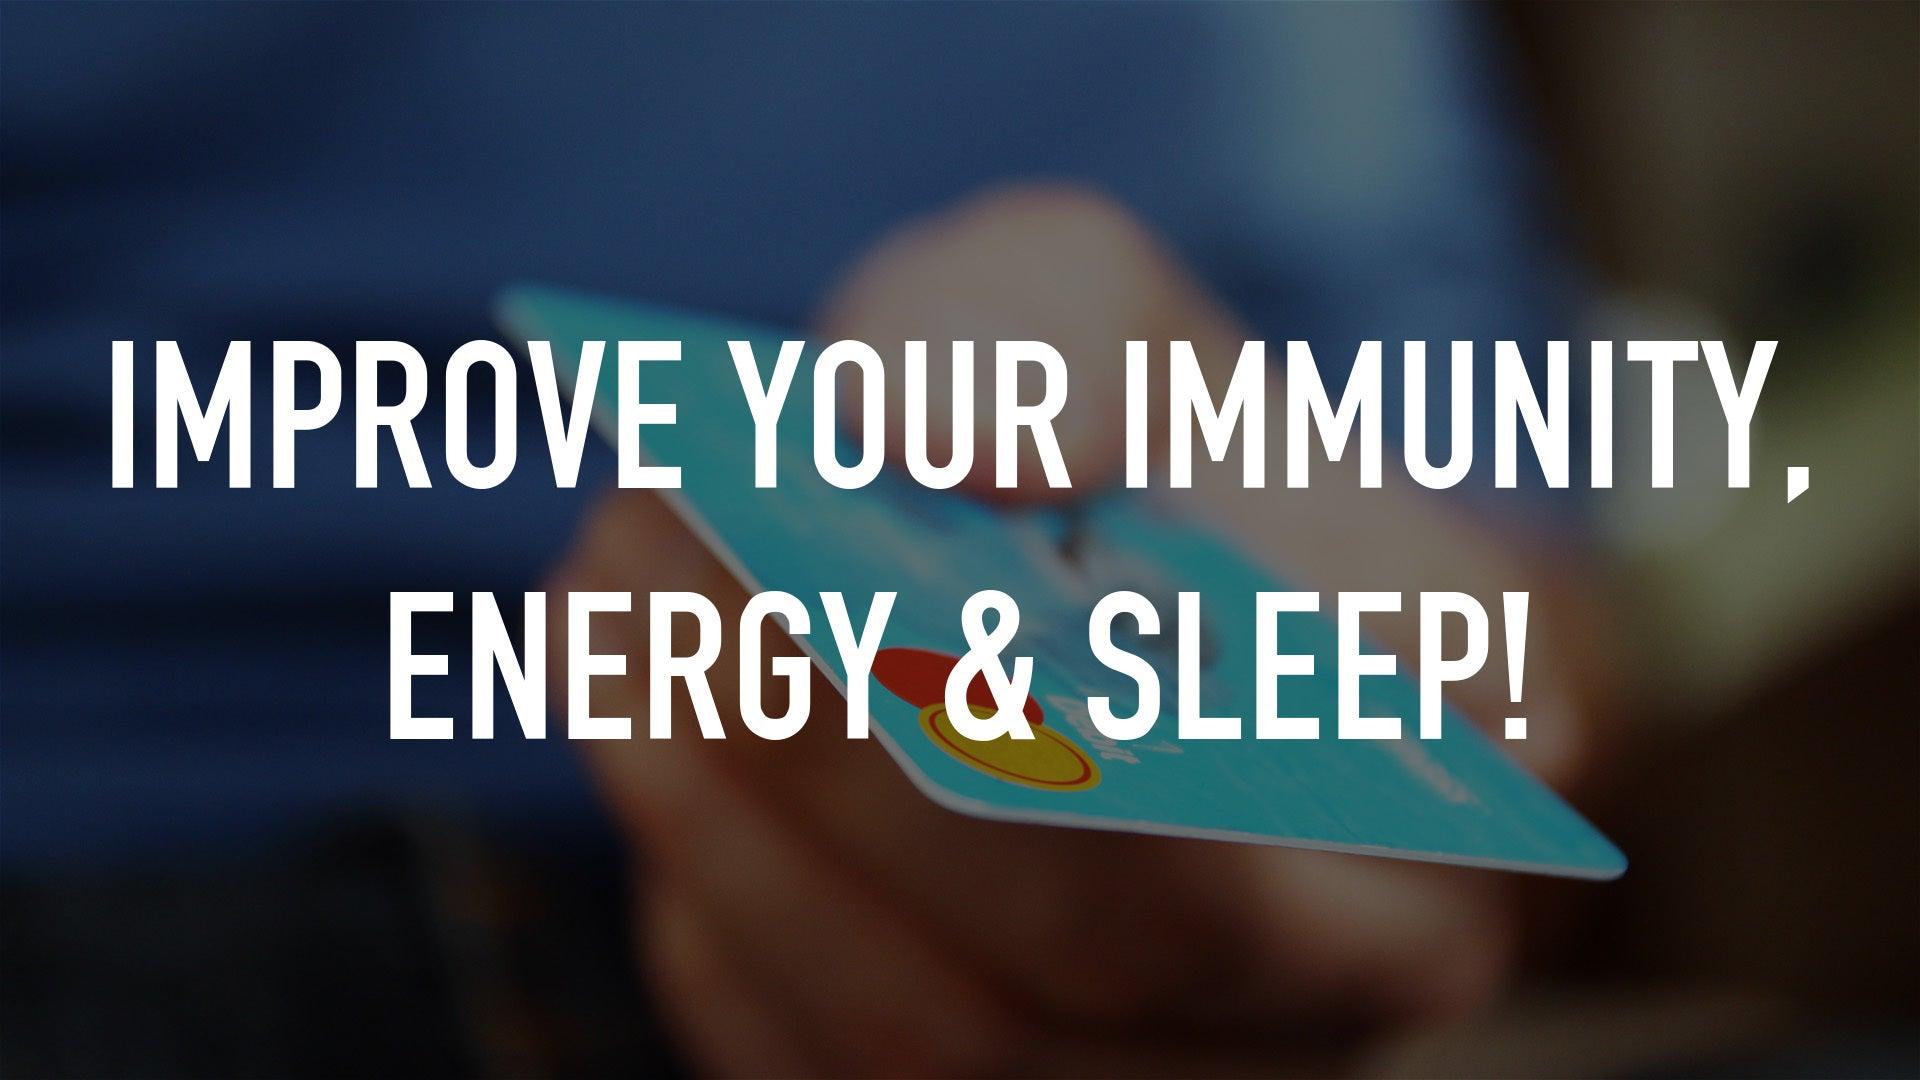 Improve Your Immunity, Energy & Sleep!